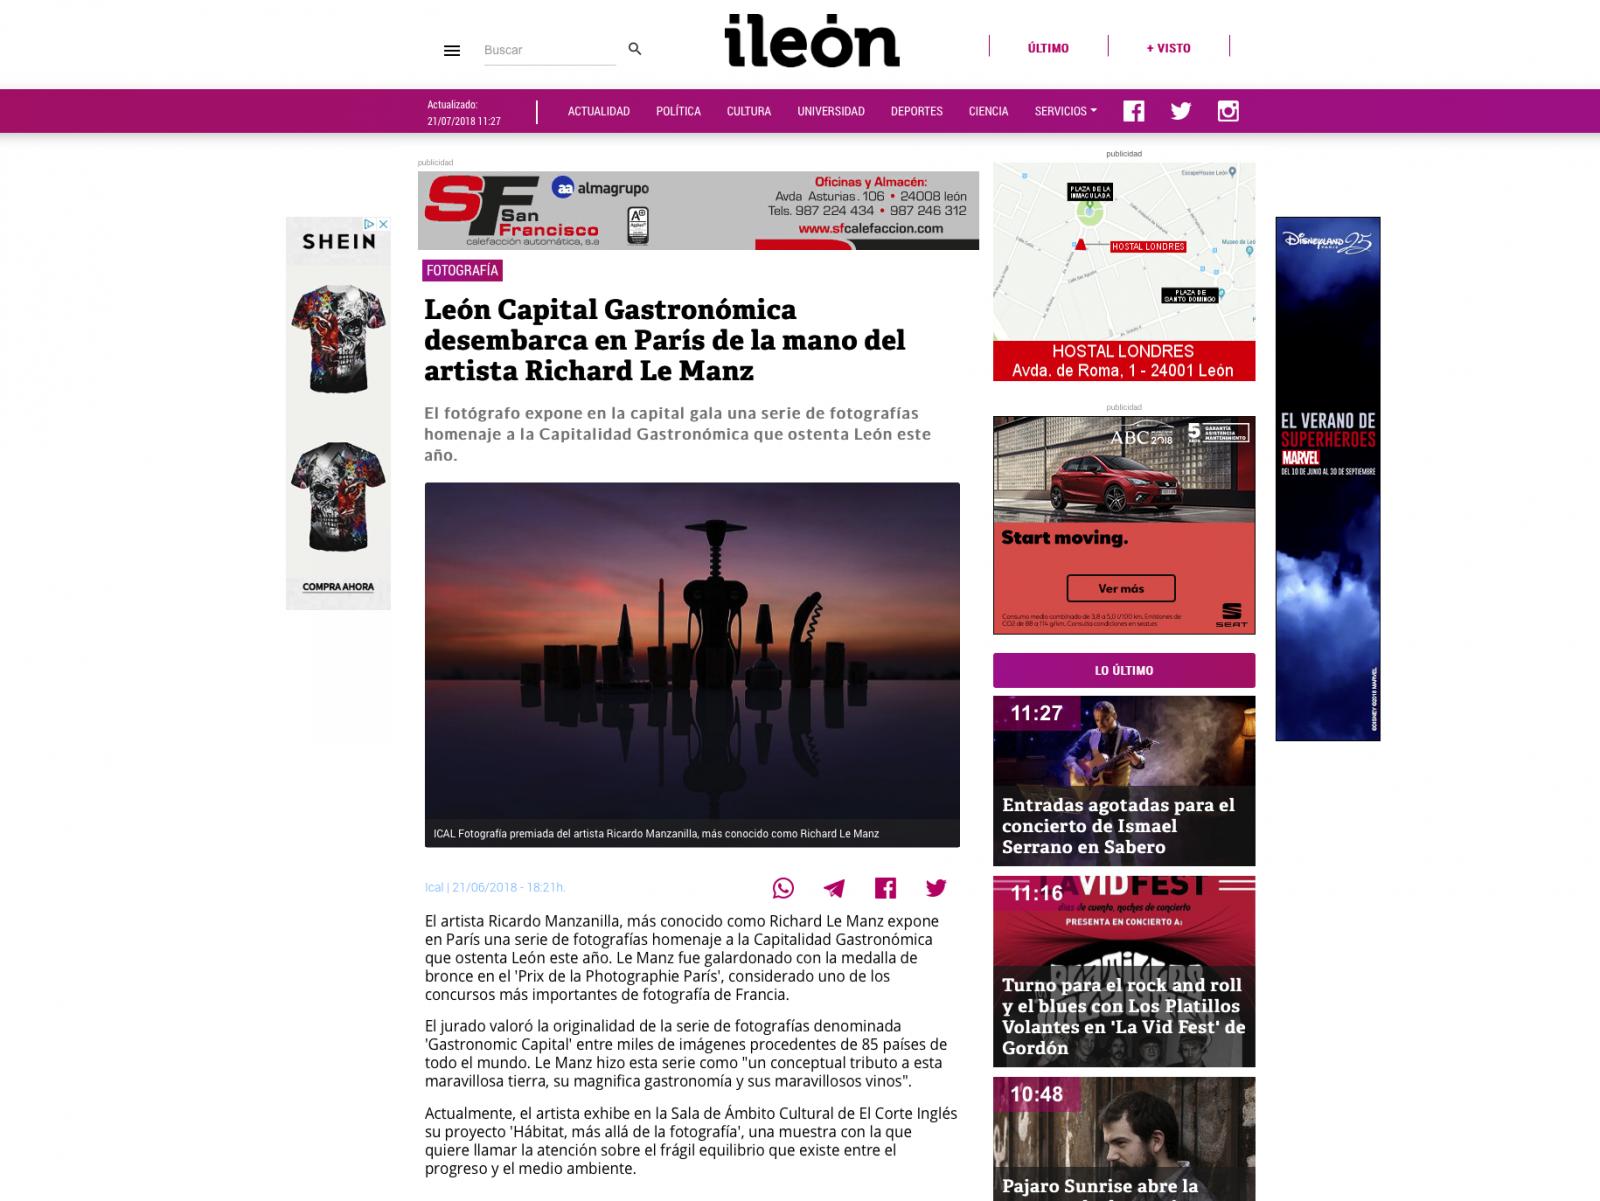 Photography image - Loading Captura_de_pantalla_2018-07-21_a_las_11.52.08.png